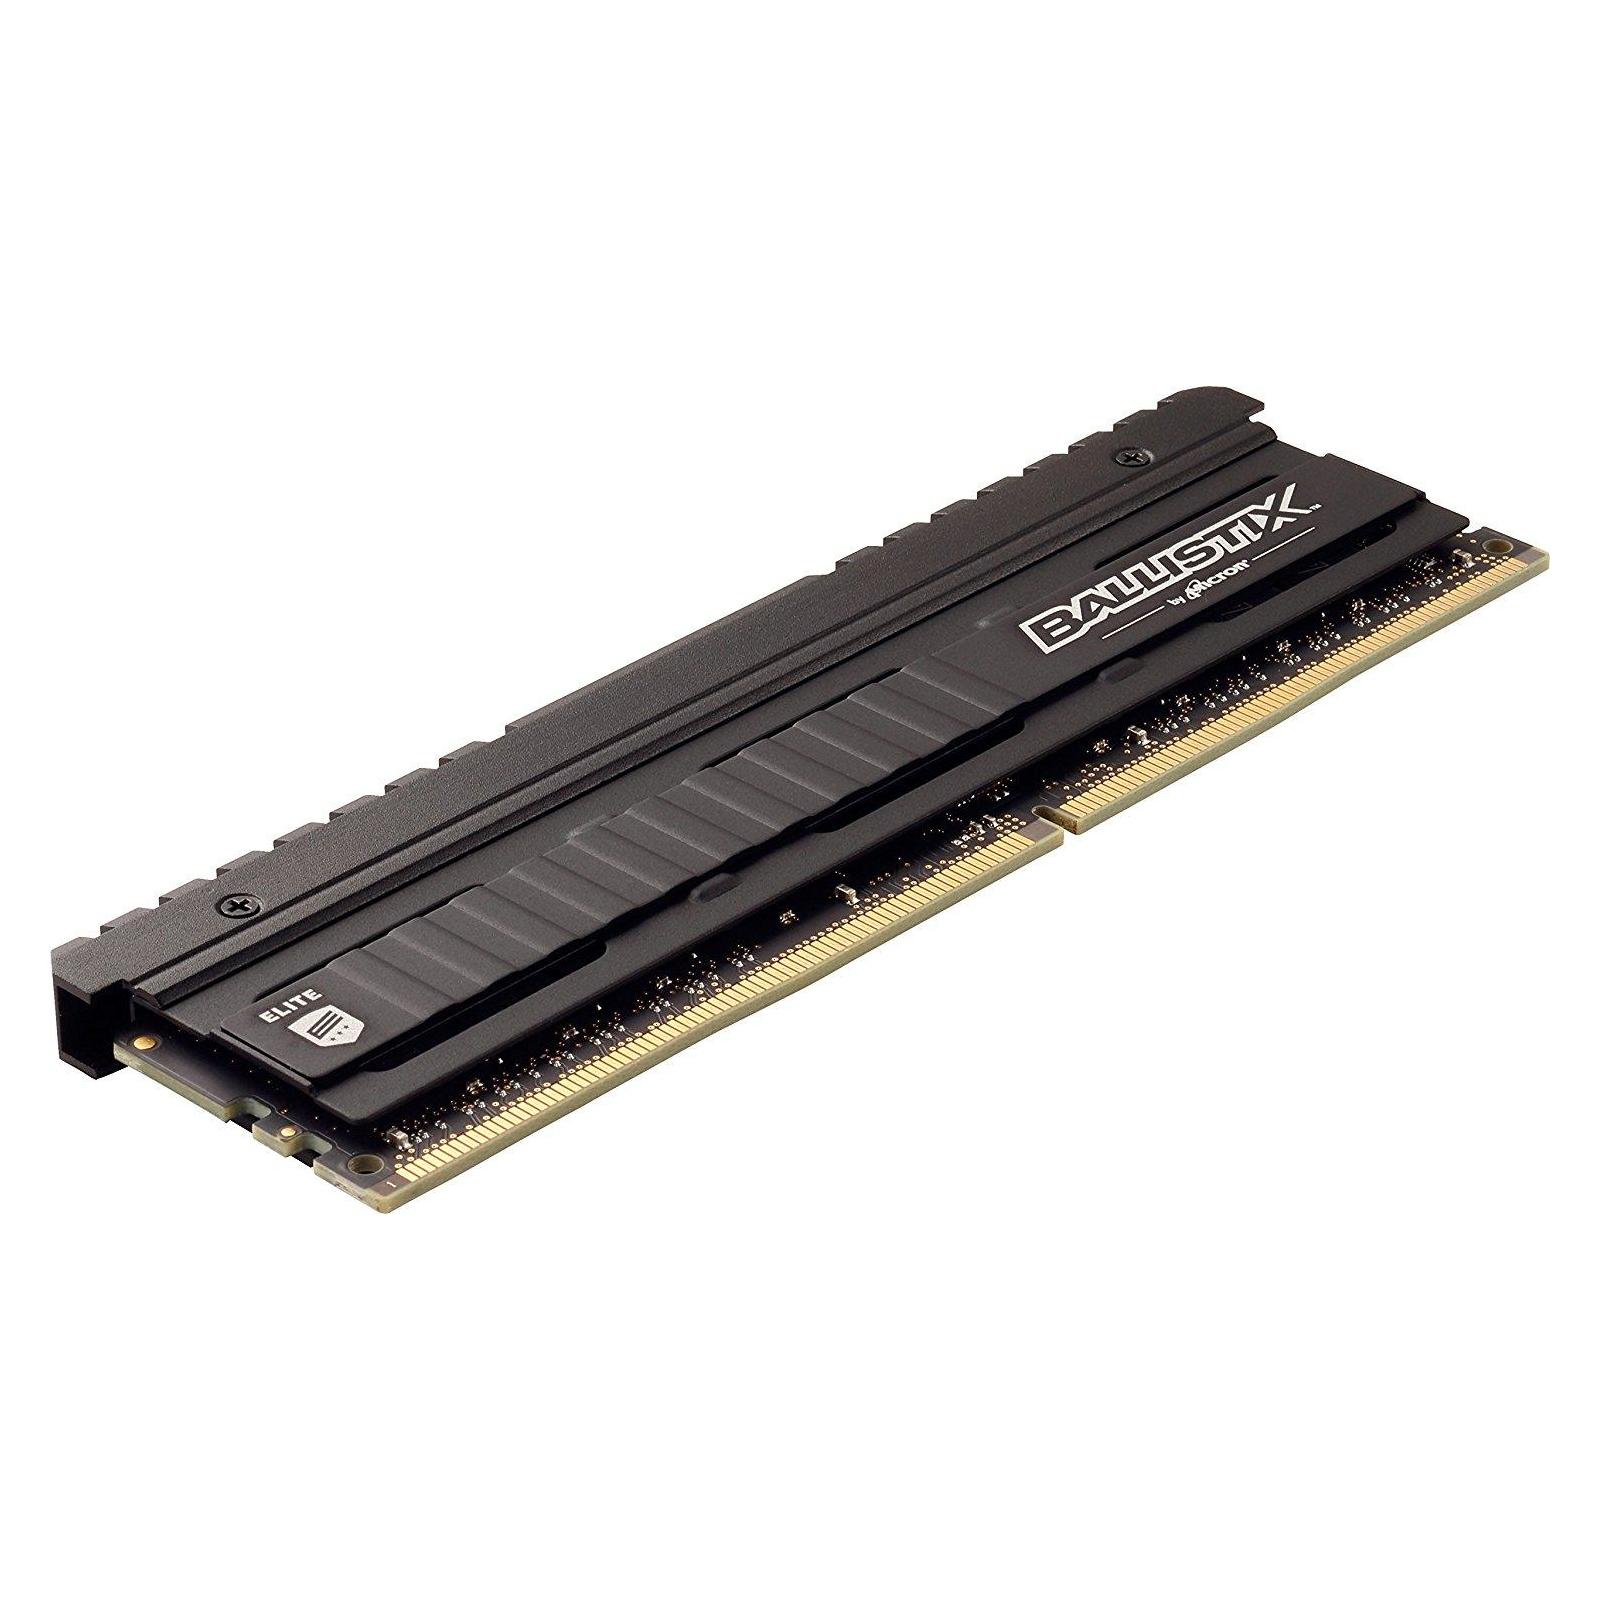 Модуль памяти для компьютера DDR4 16GB (2x8GB) 3200 MHz Ballistix Elite Micron (BLE2C8G4D32BEEAK) изображение 4